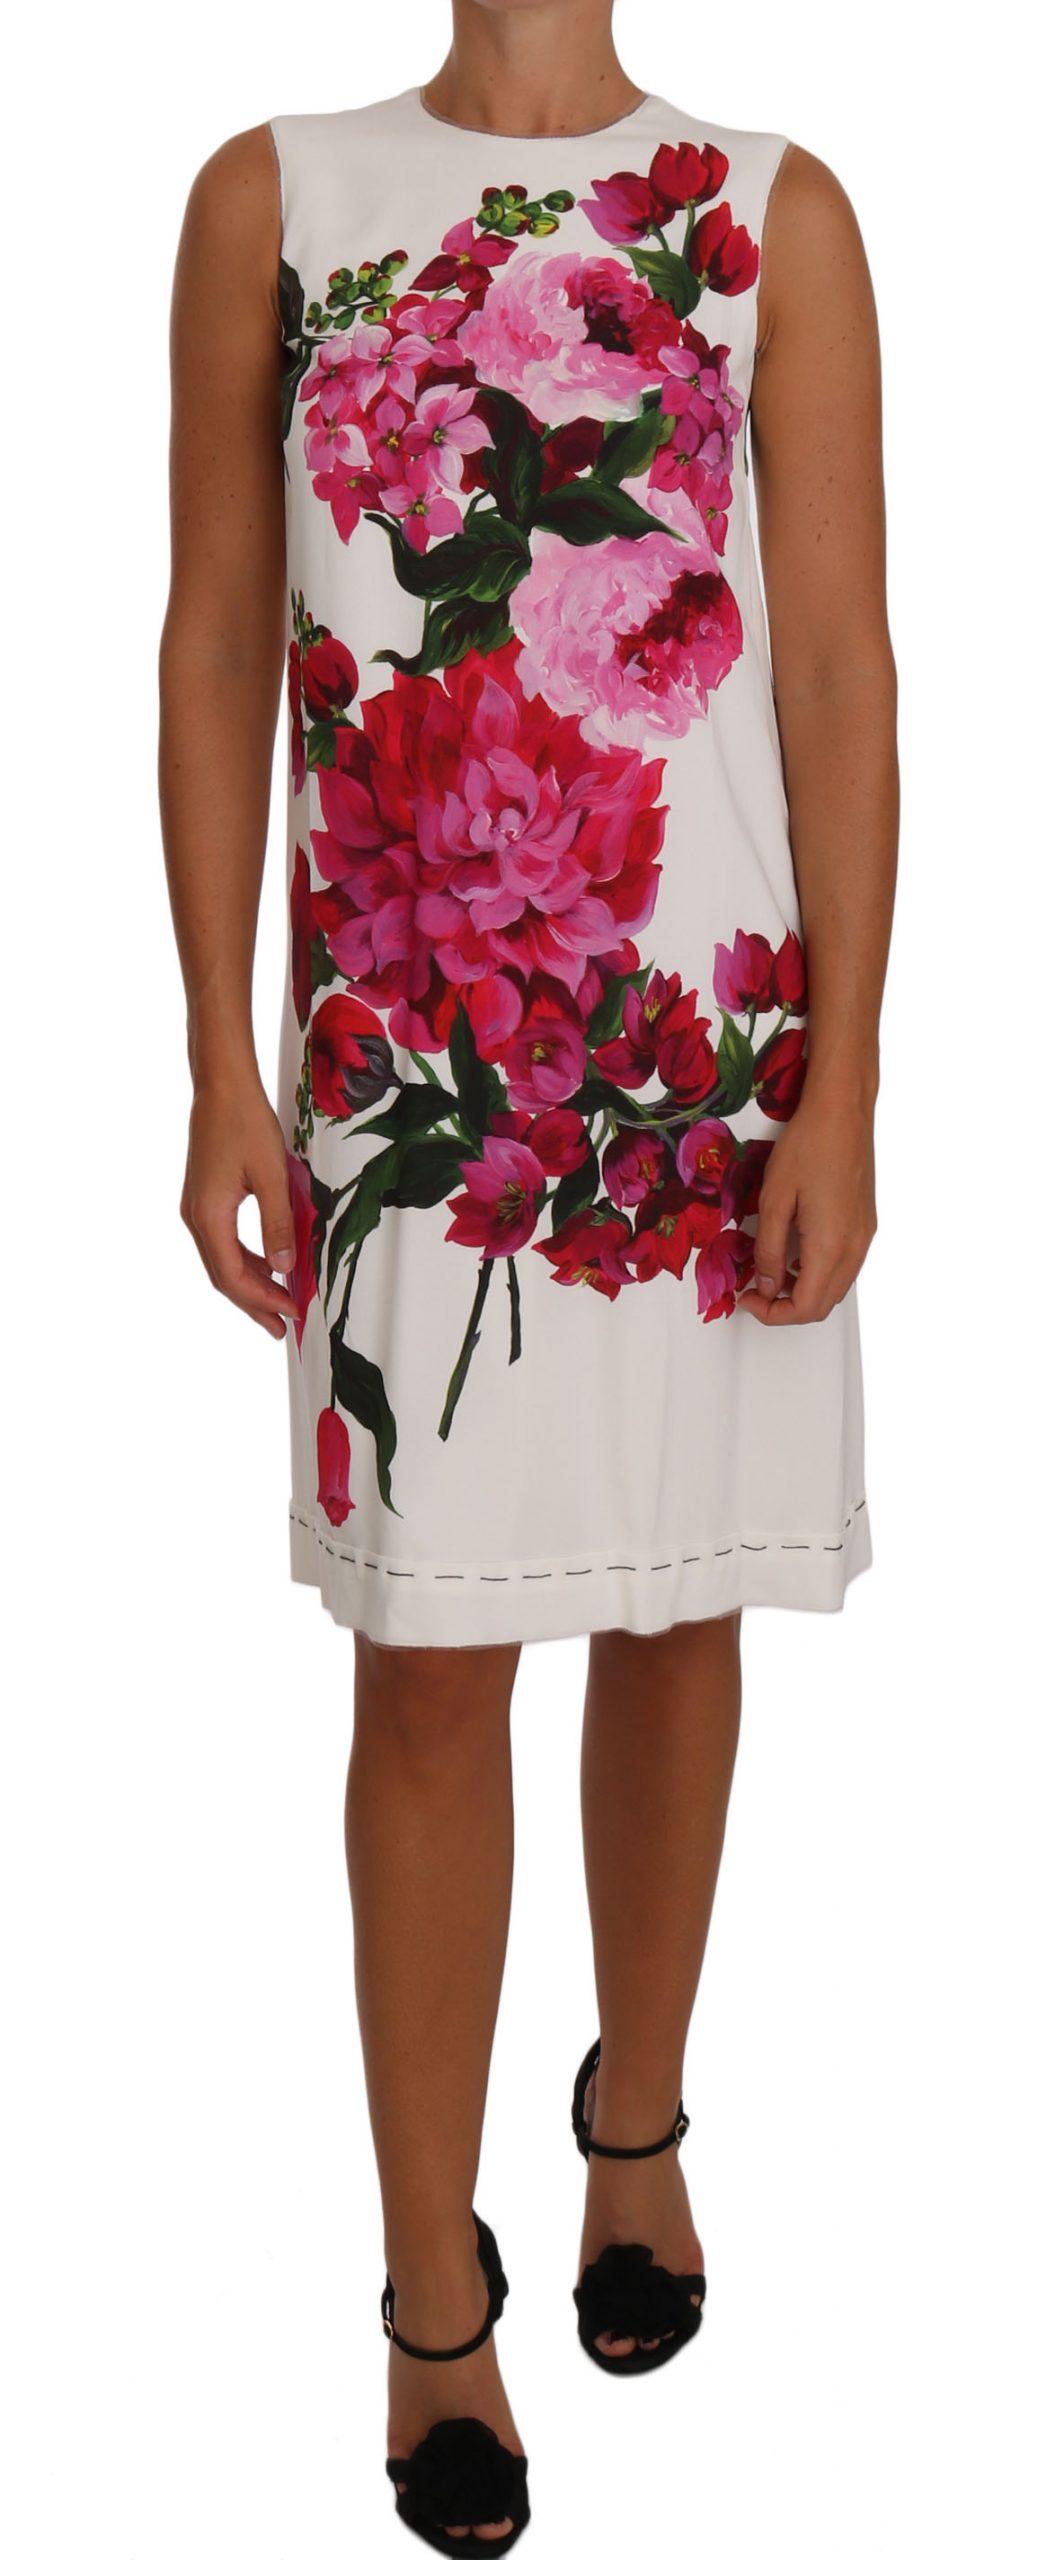 Dolce & Gabbana Women's Peony Print A-Line Shift Gown Dress Multicolor DR1481 - IT36 | XS